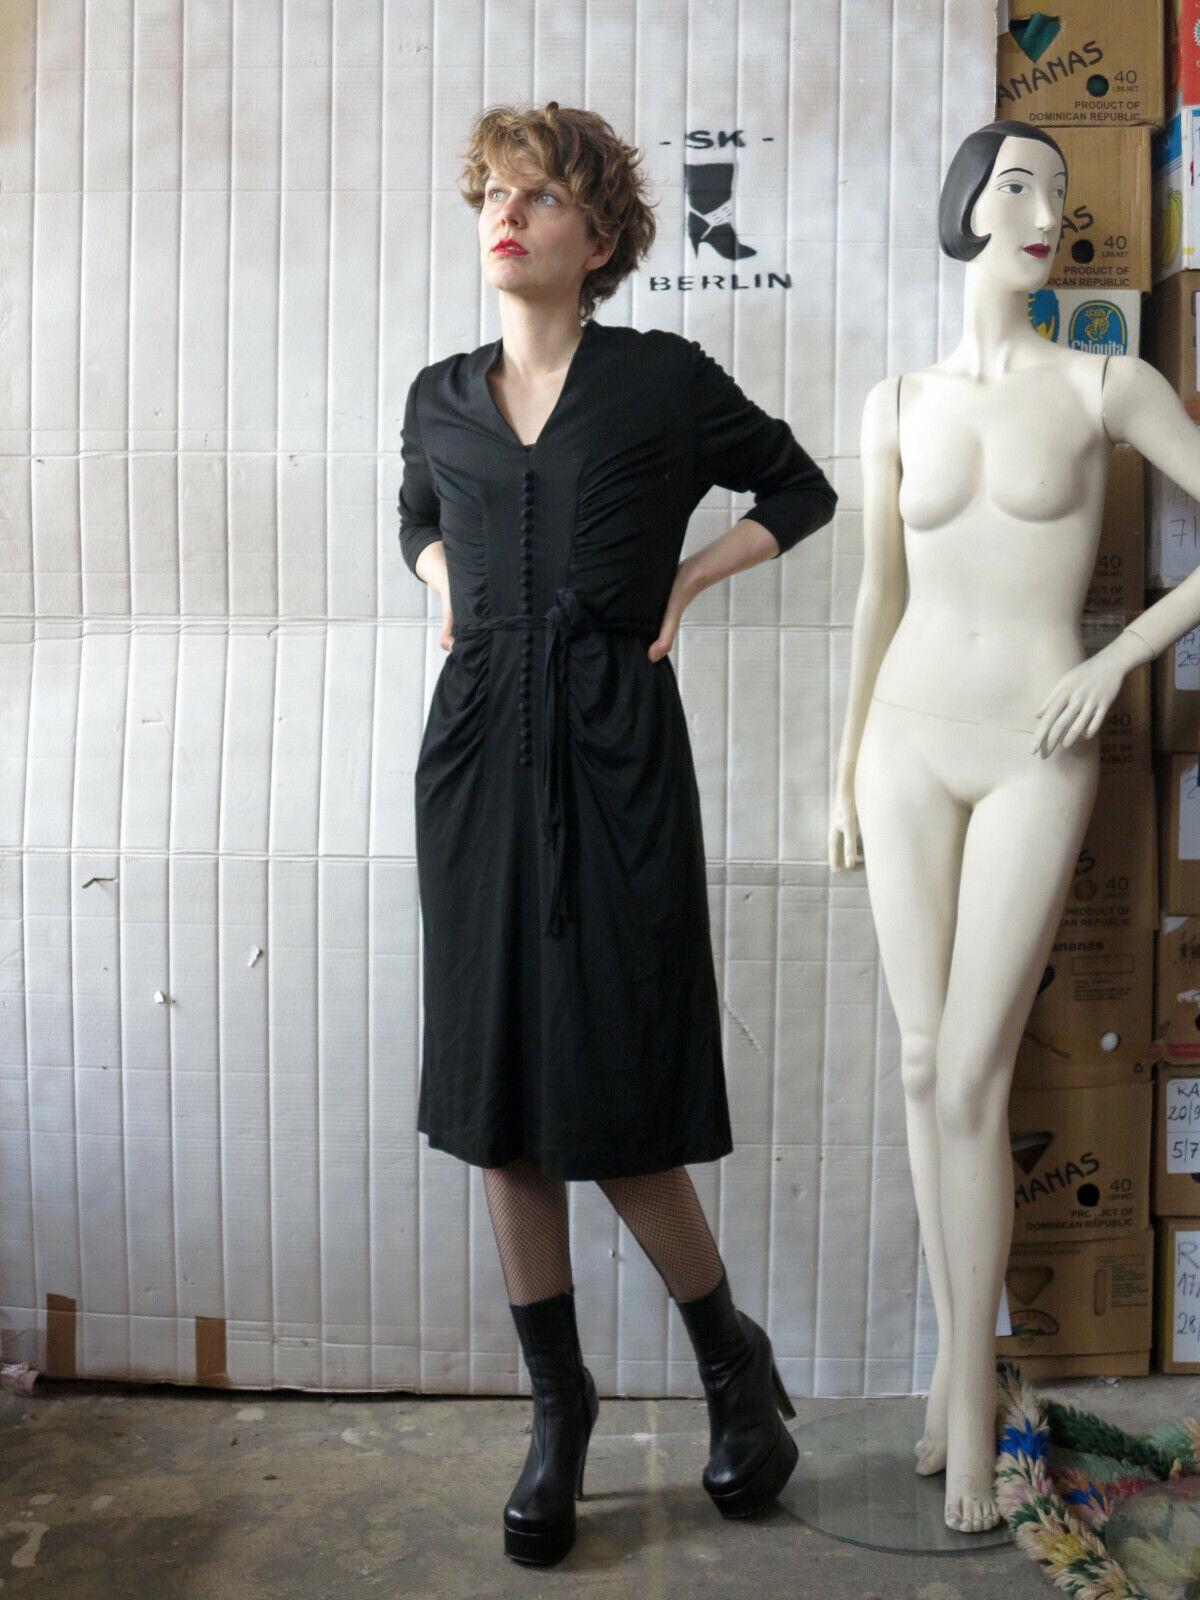 Uli Richter Design Kleid Abendkleid Party 70er True VINTAGE 70s damen dress